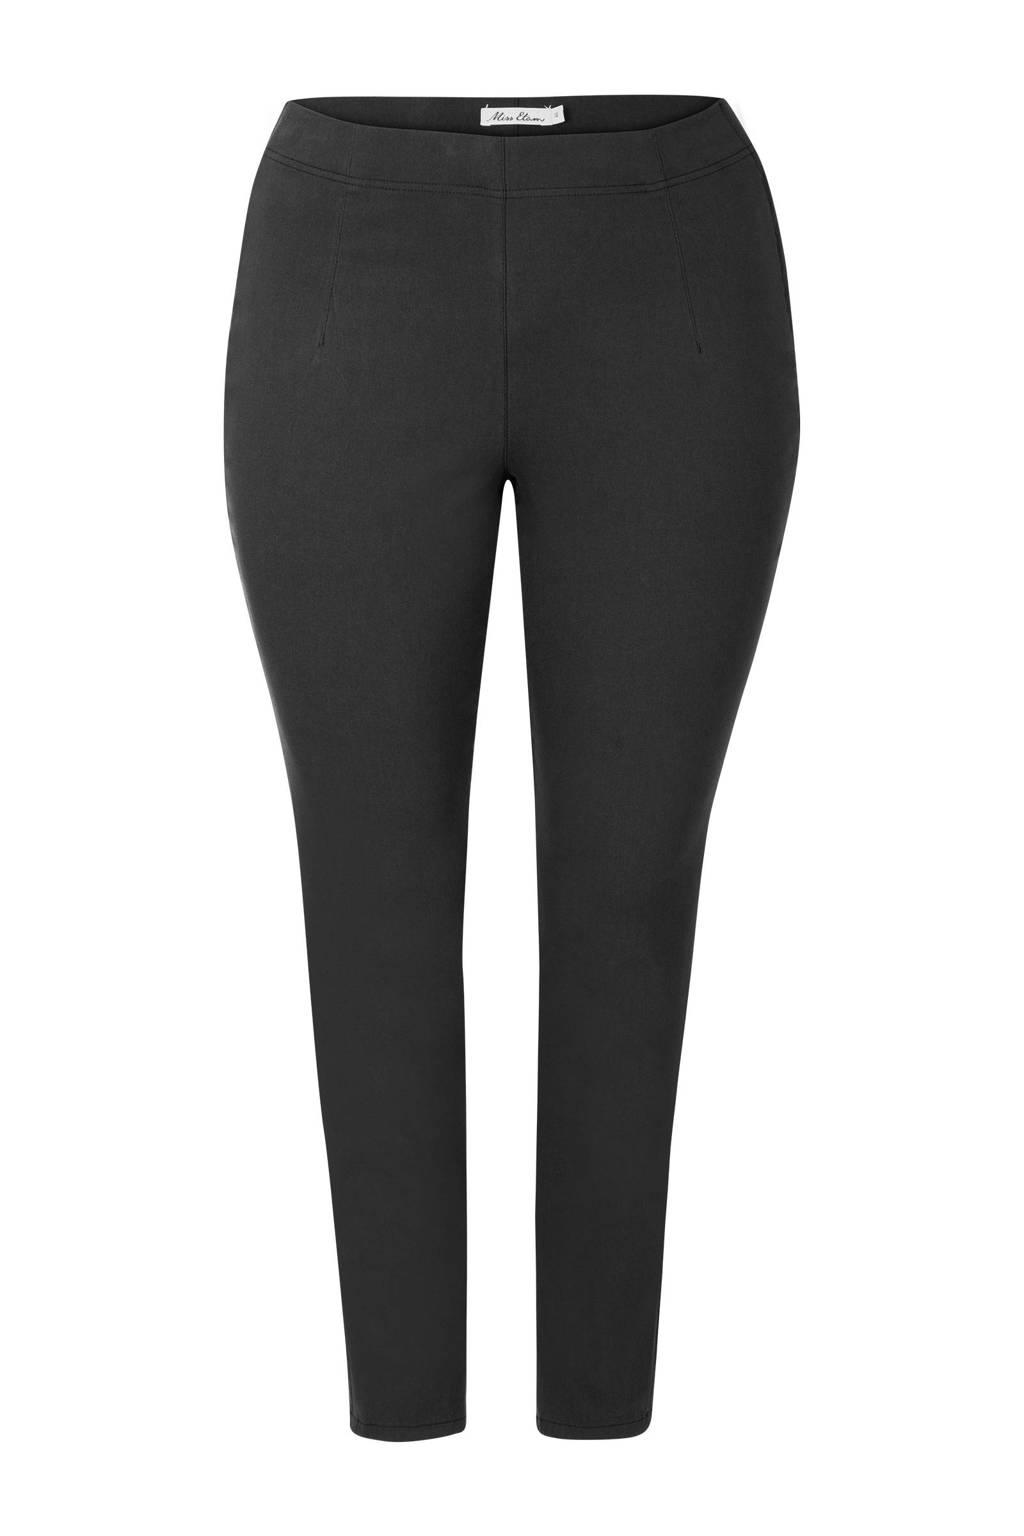 Miss Etam Plus broek zwart, Zwart